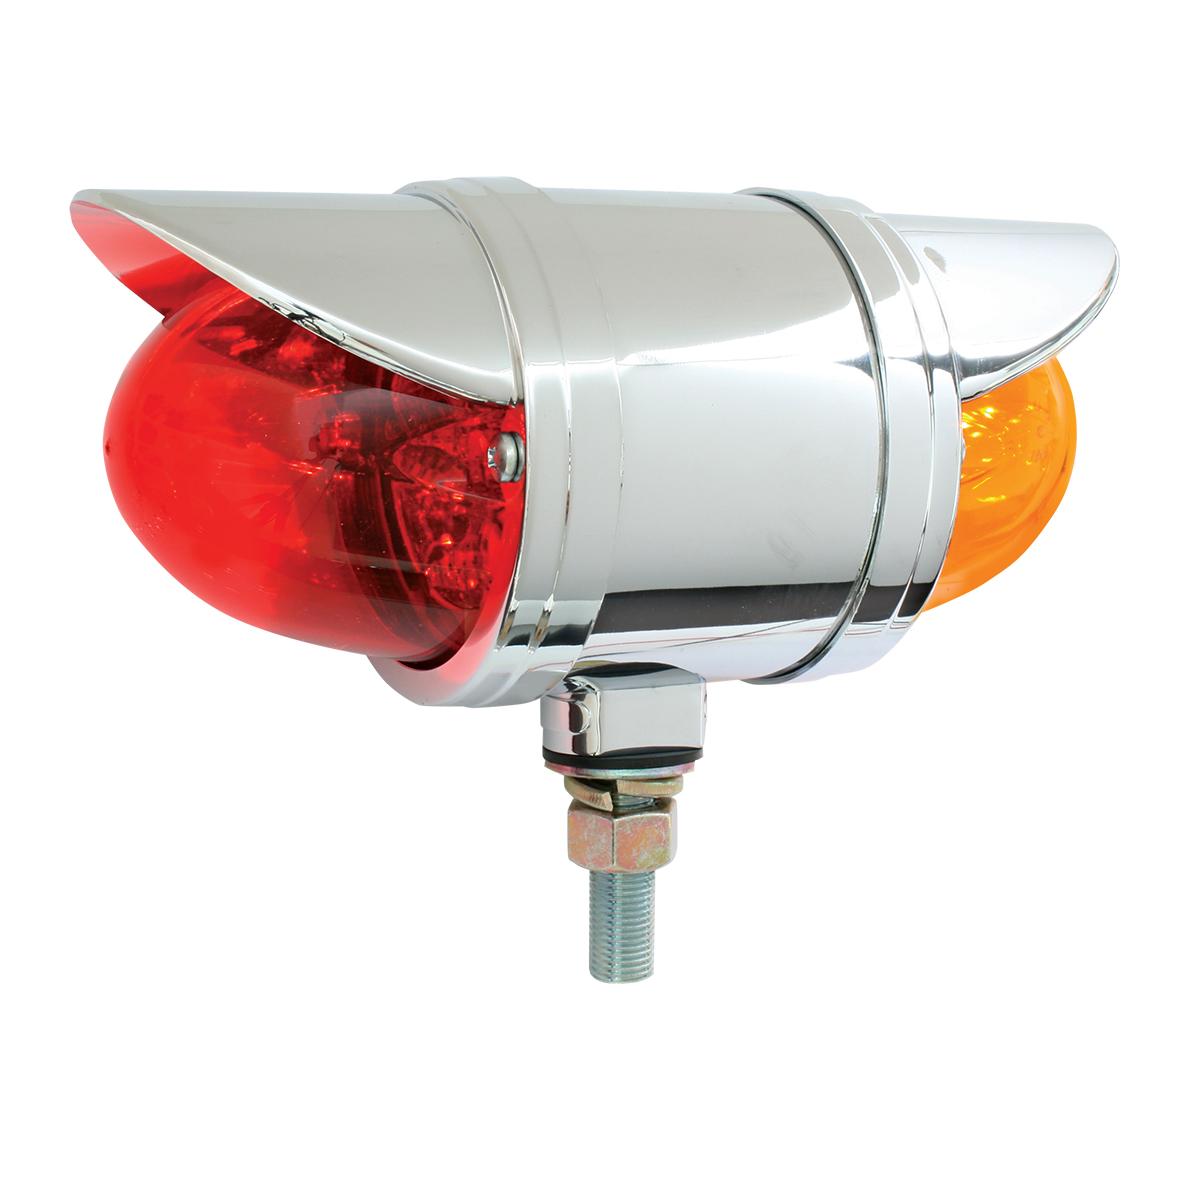 77933 Double Face Spyder LED Pedestal Light